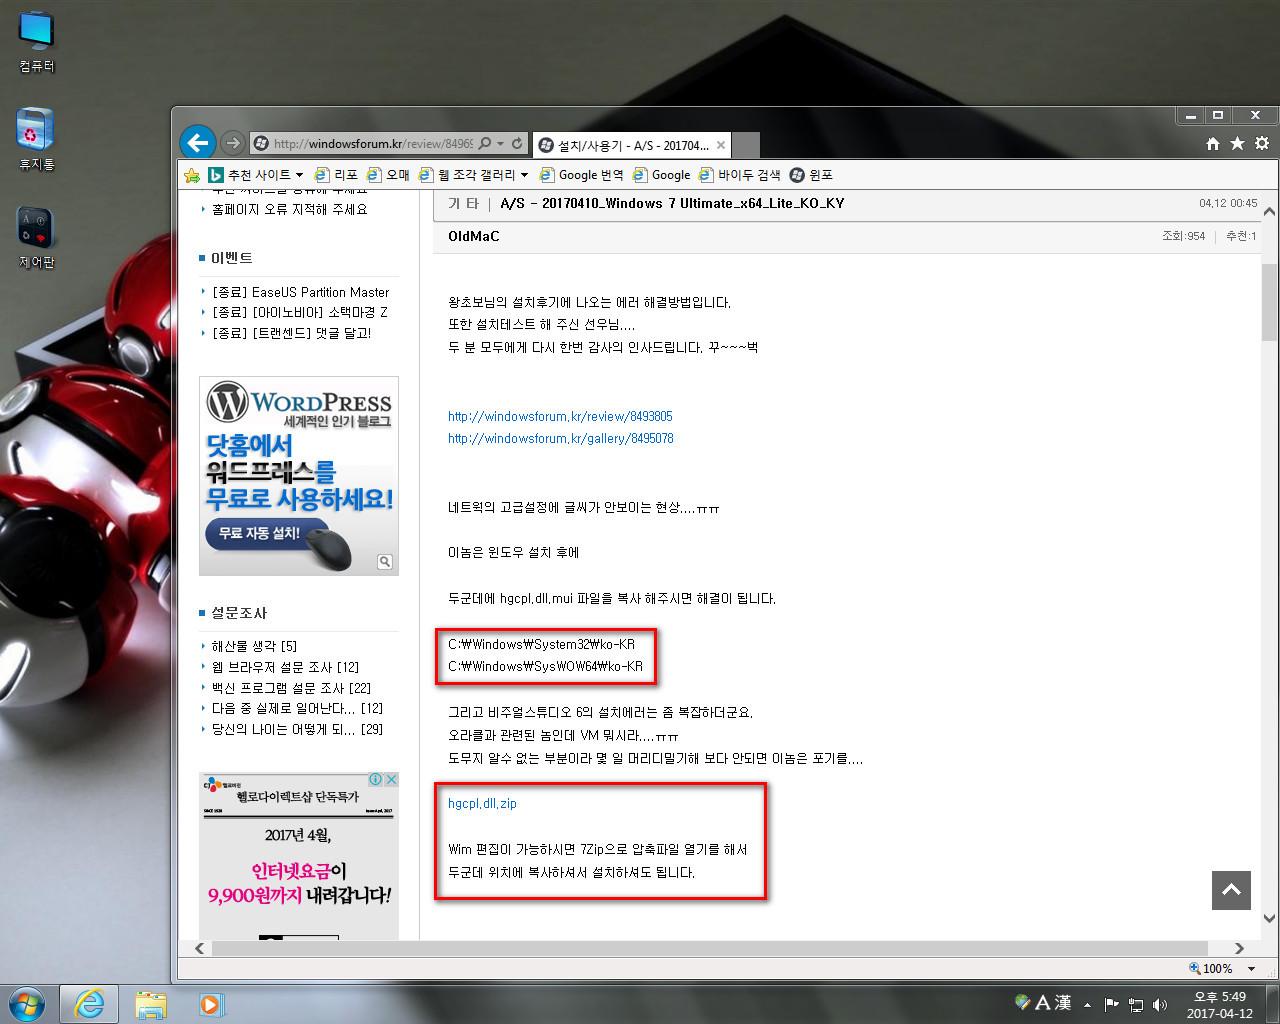 hgcpl.dll.mui_02.jpg